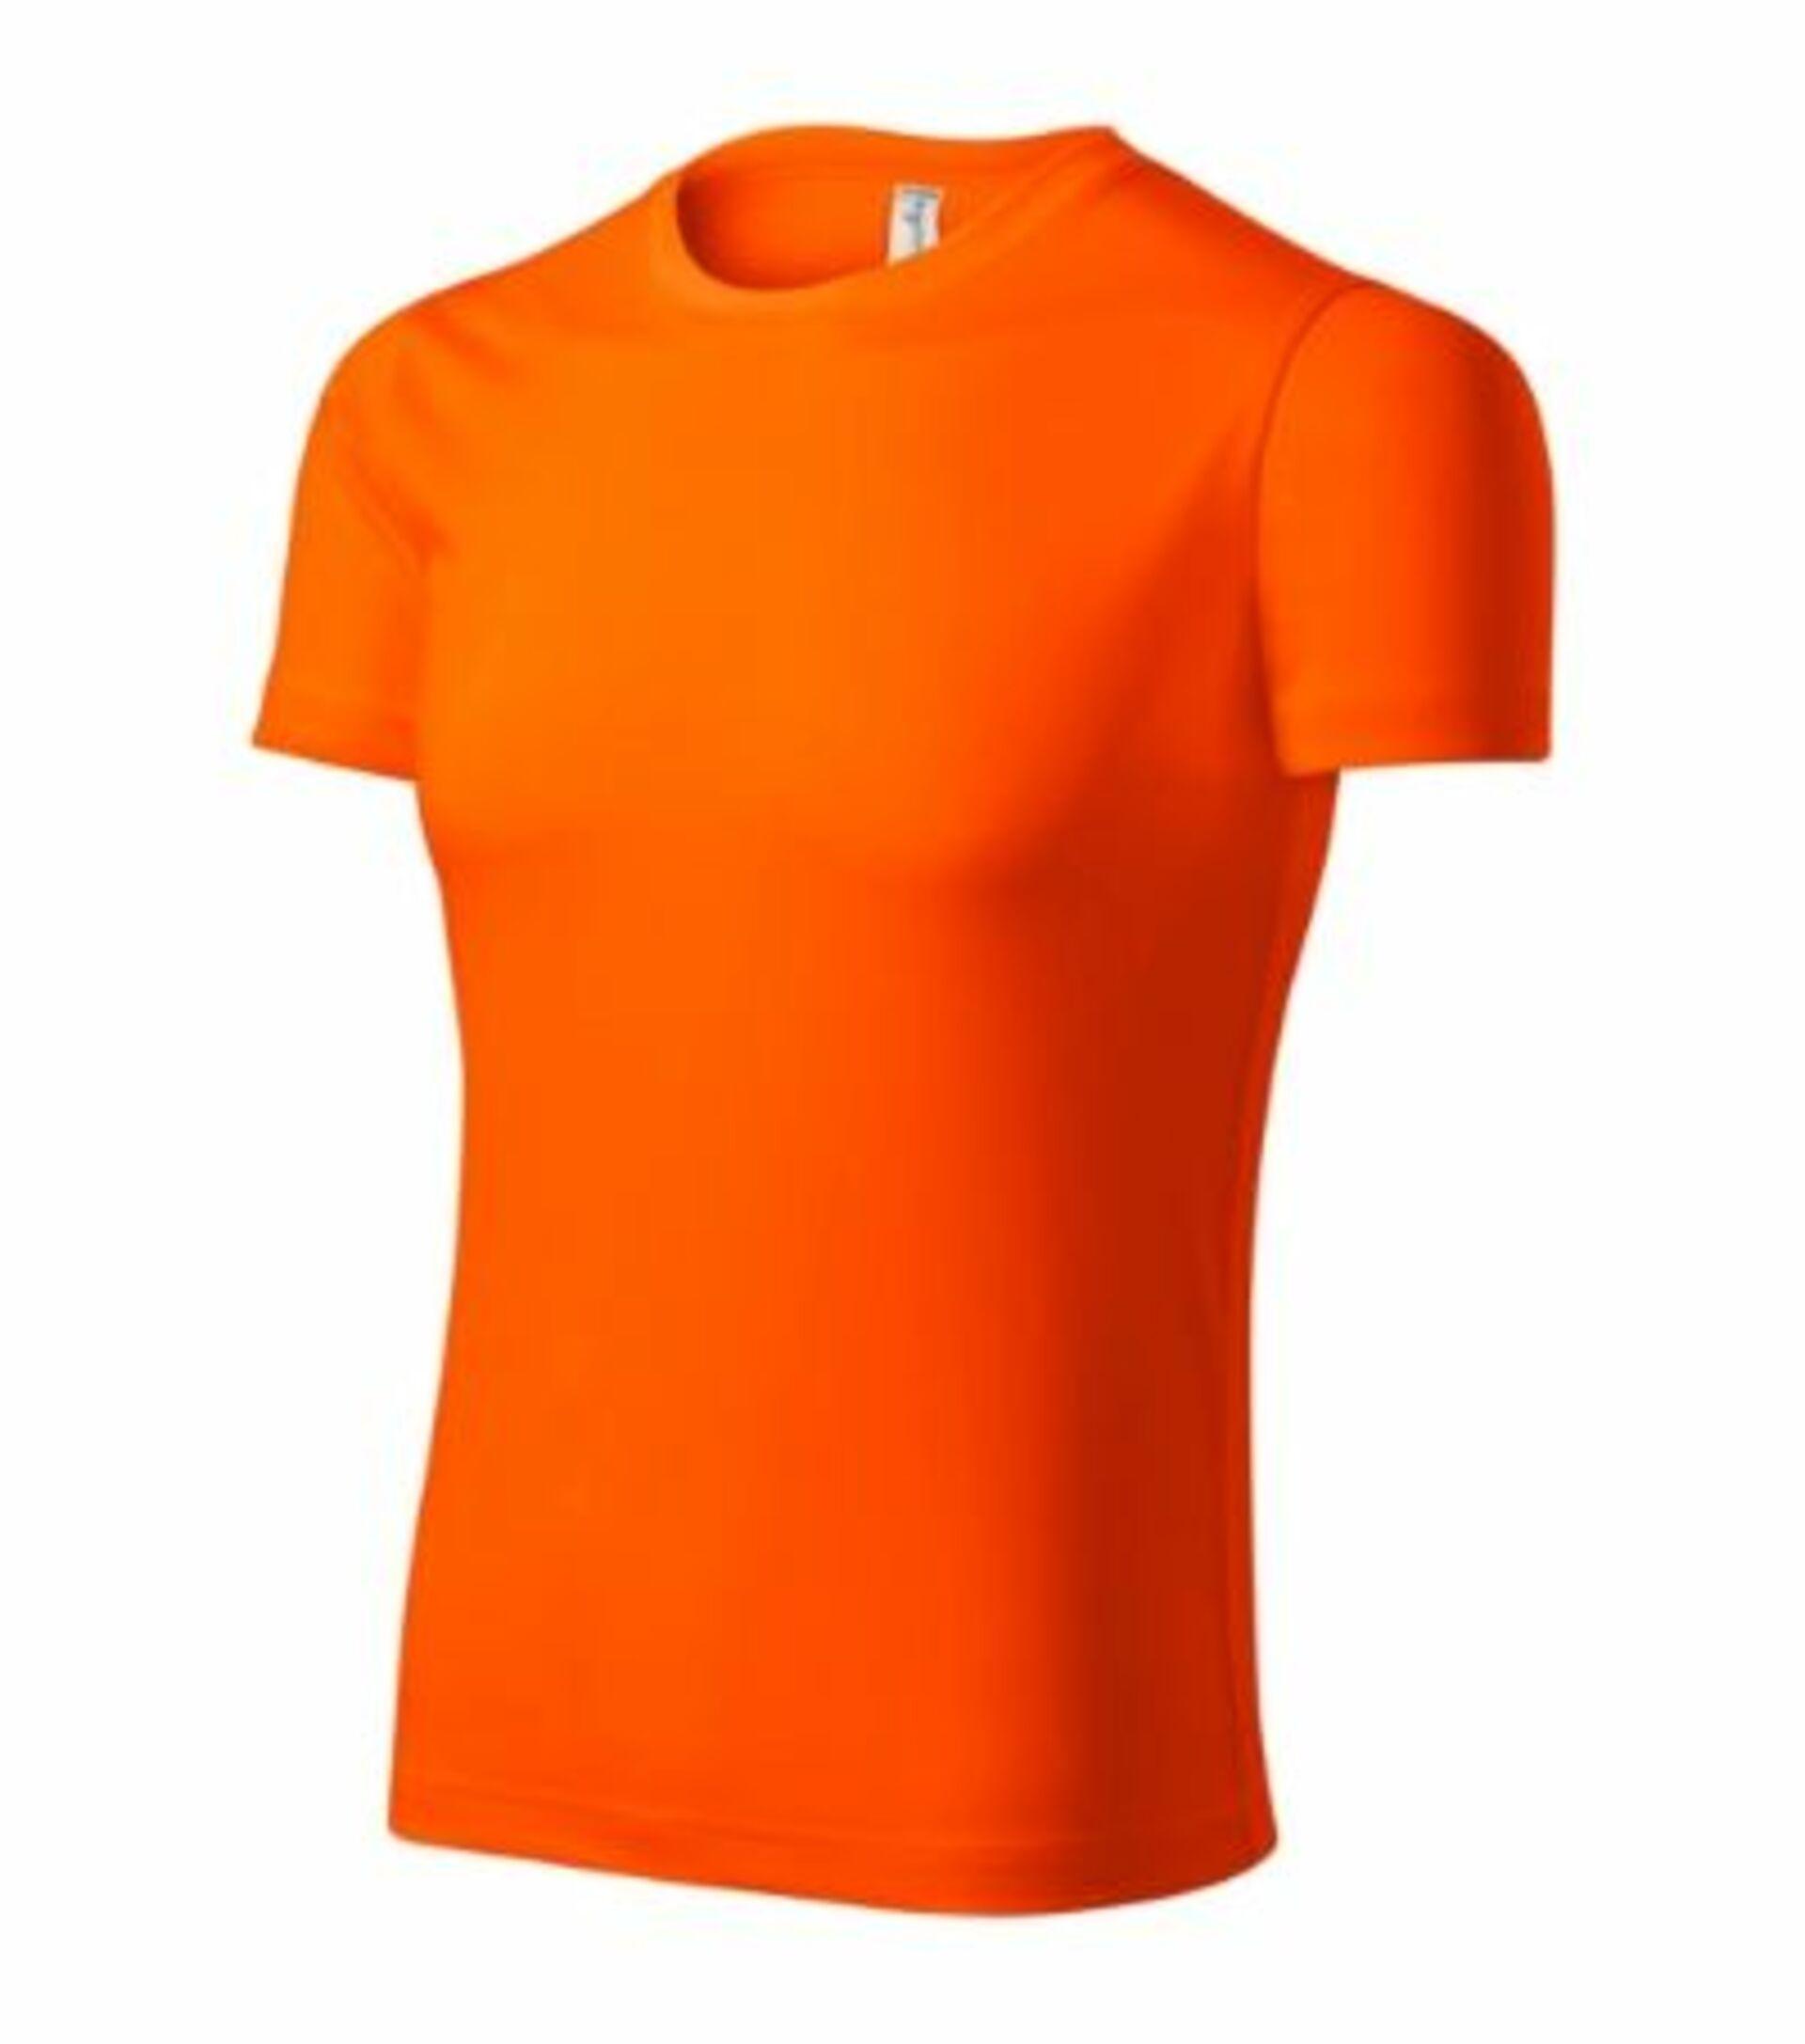 Malfini ADLER PIXEL P81 Tričko oranžová L